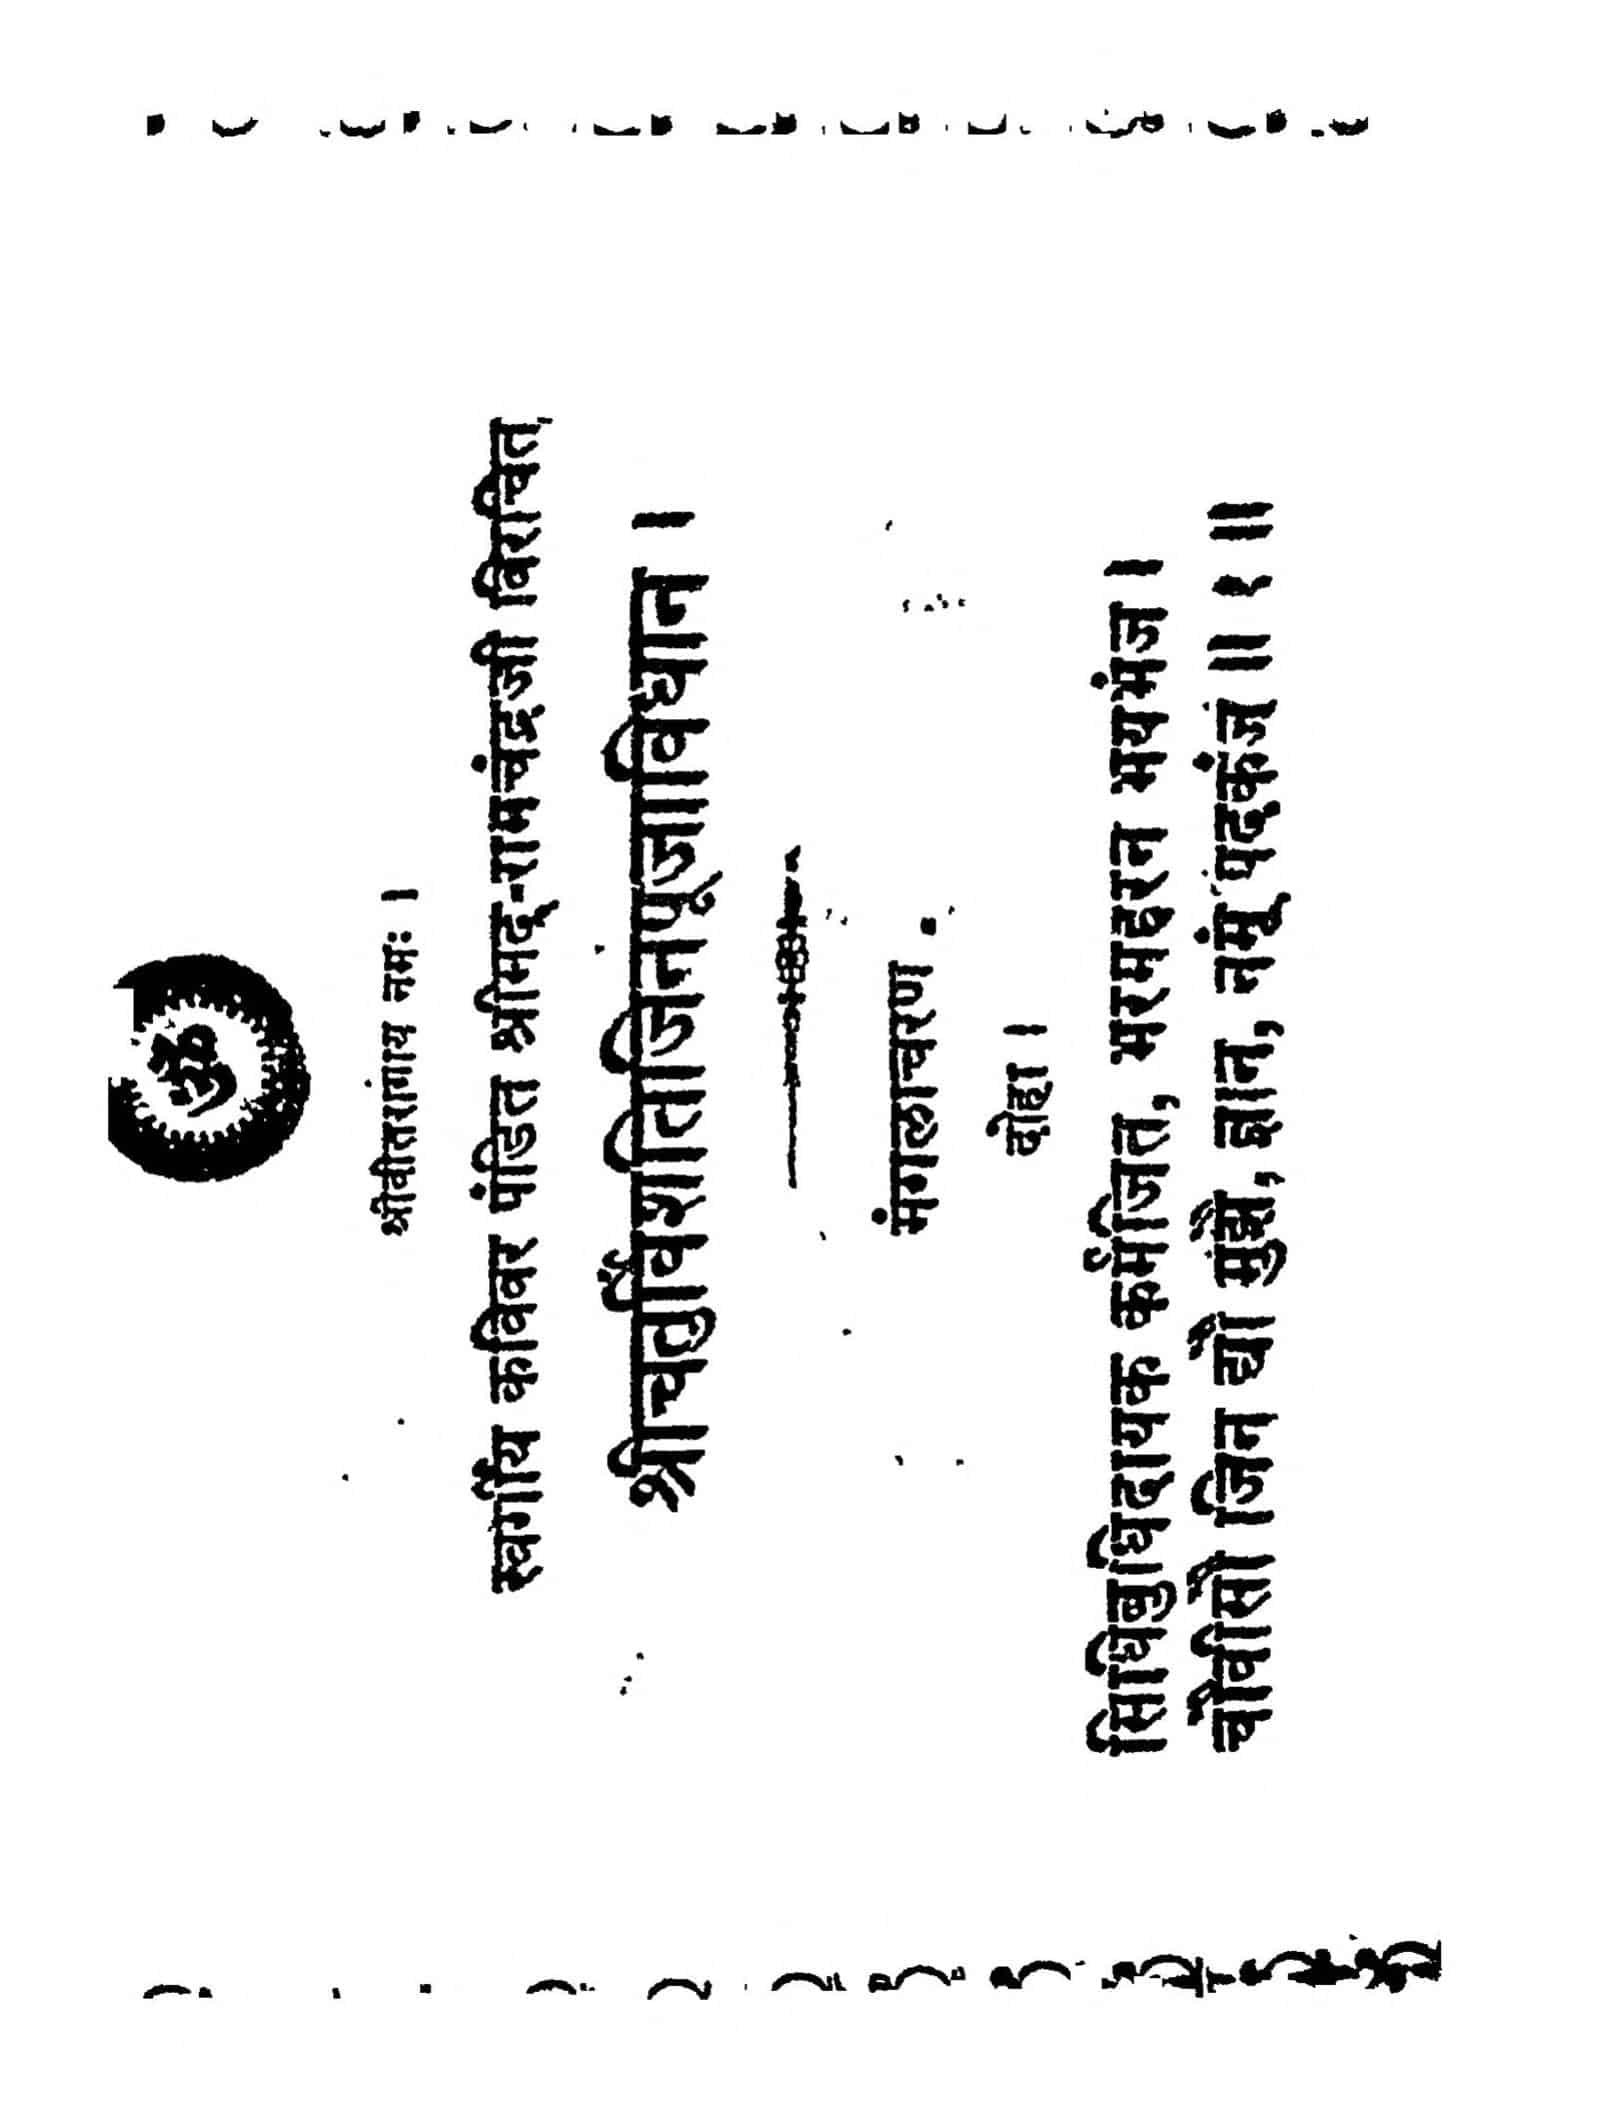 Book Image : श्रीचतुर्विंसतिजिनपूजाविधान  - Shrichaturvimsatijinapoojavidhan